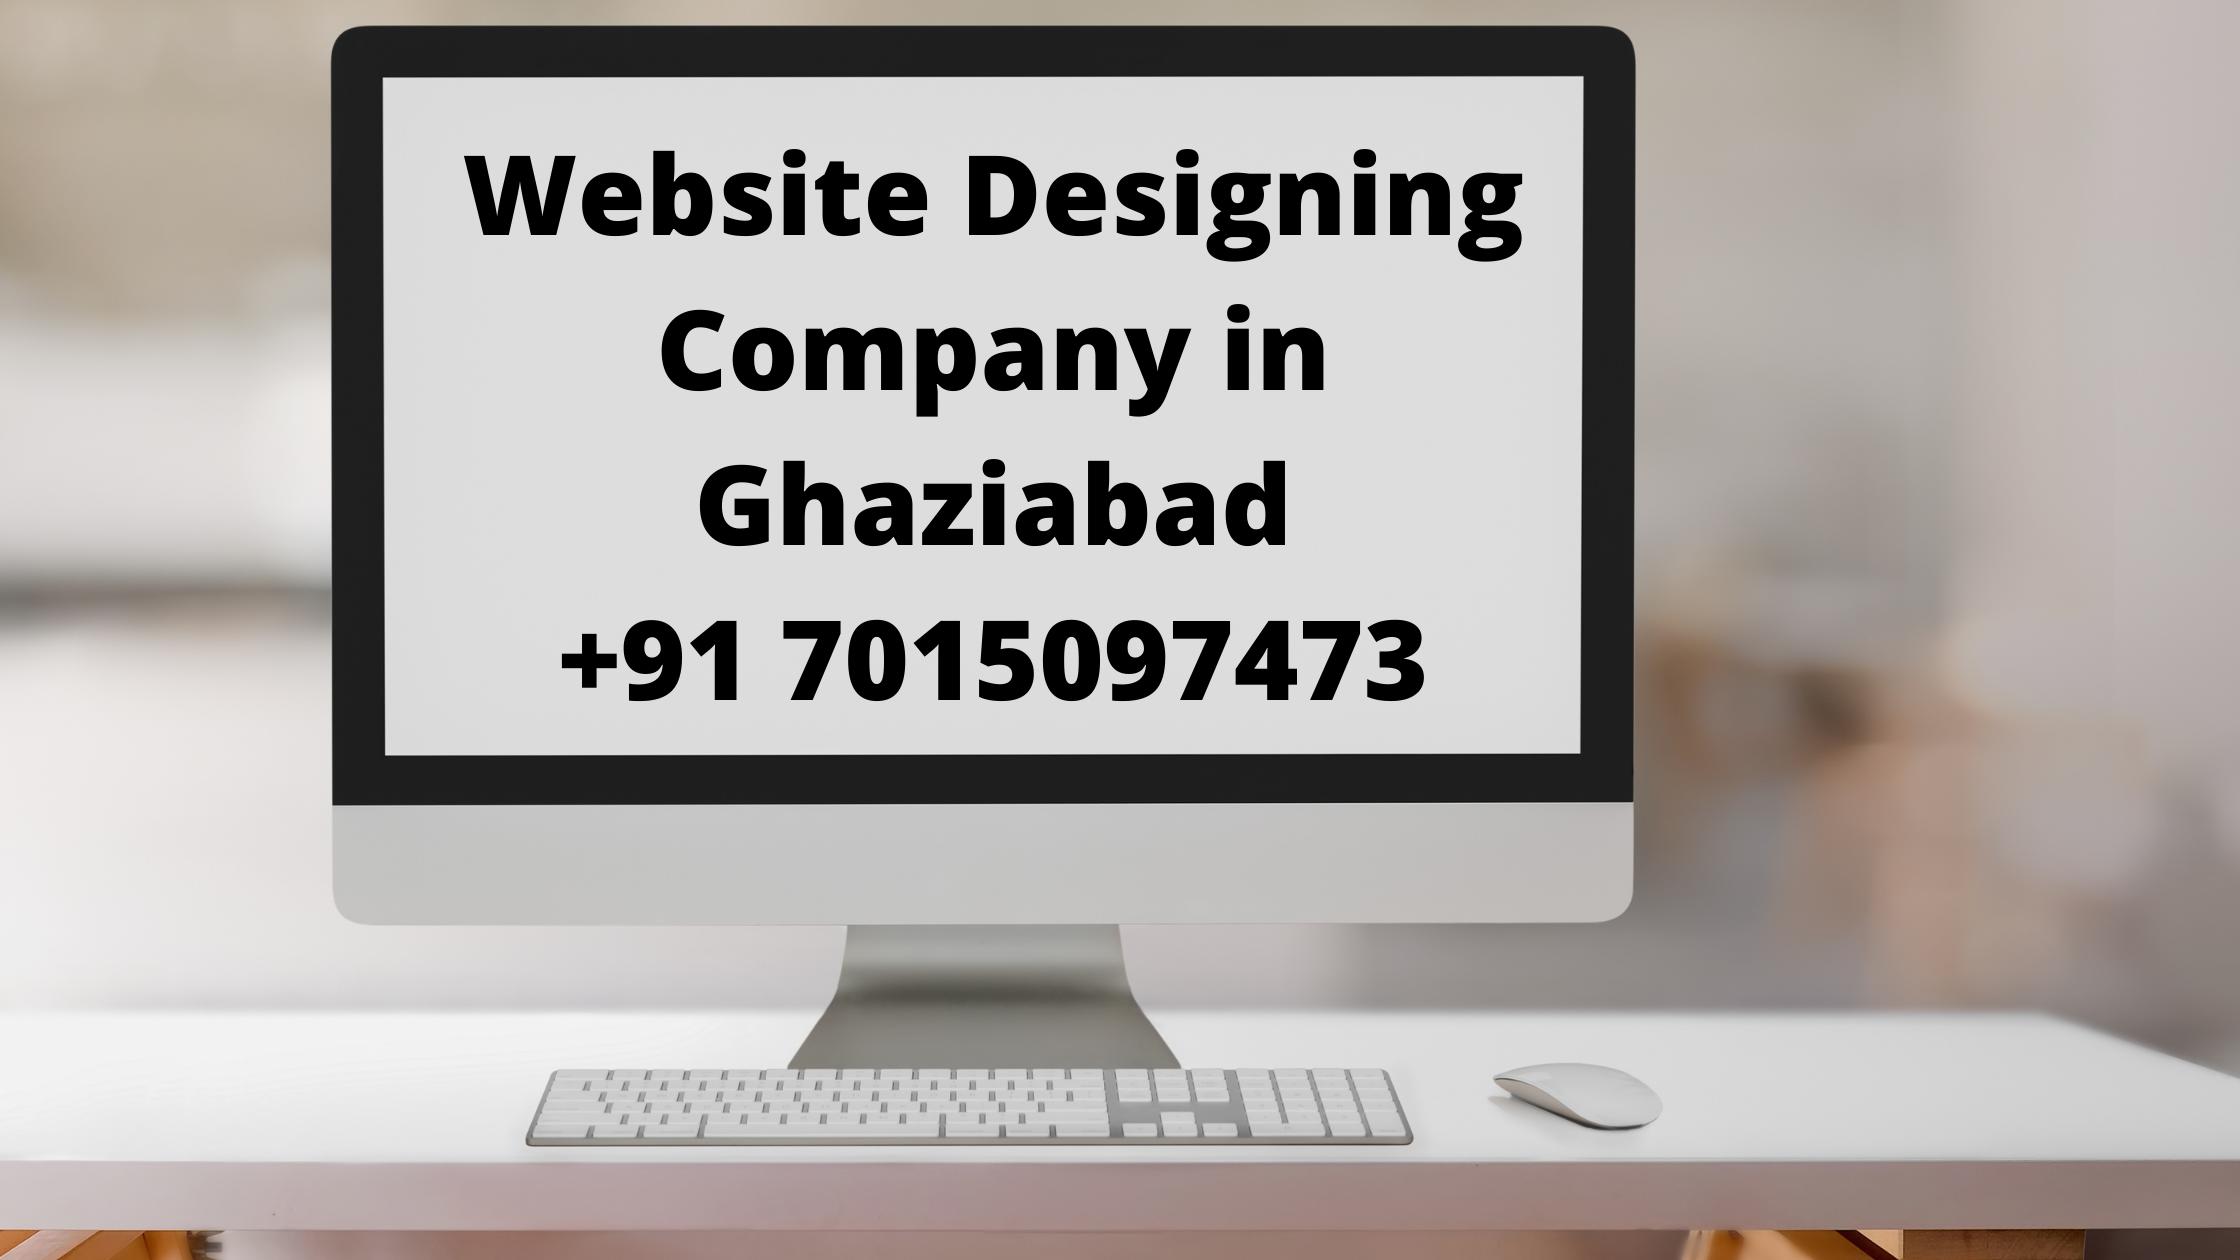 Website Designing Company in Ghaziabad